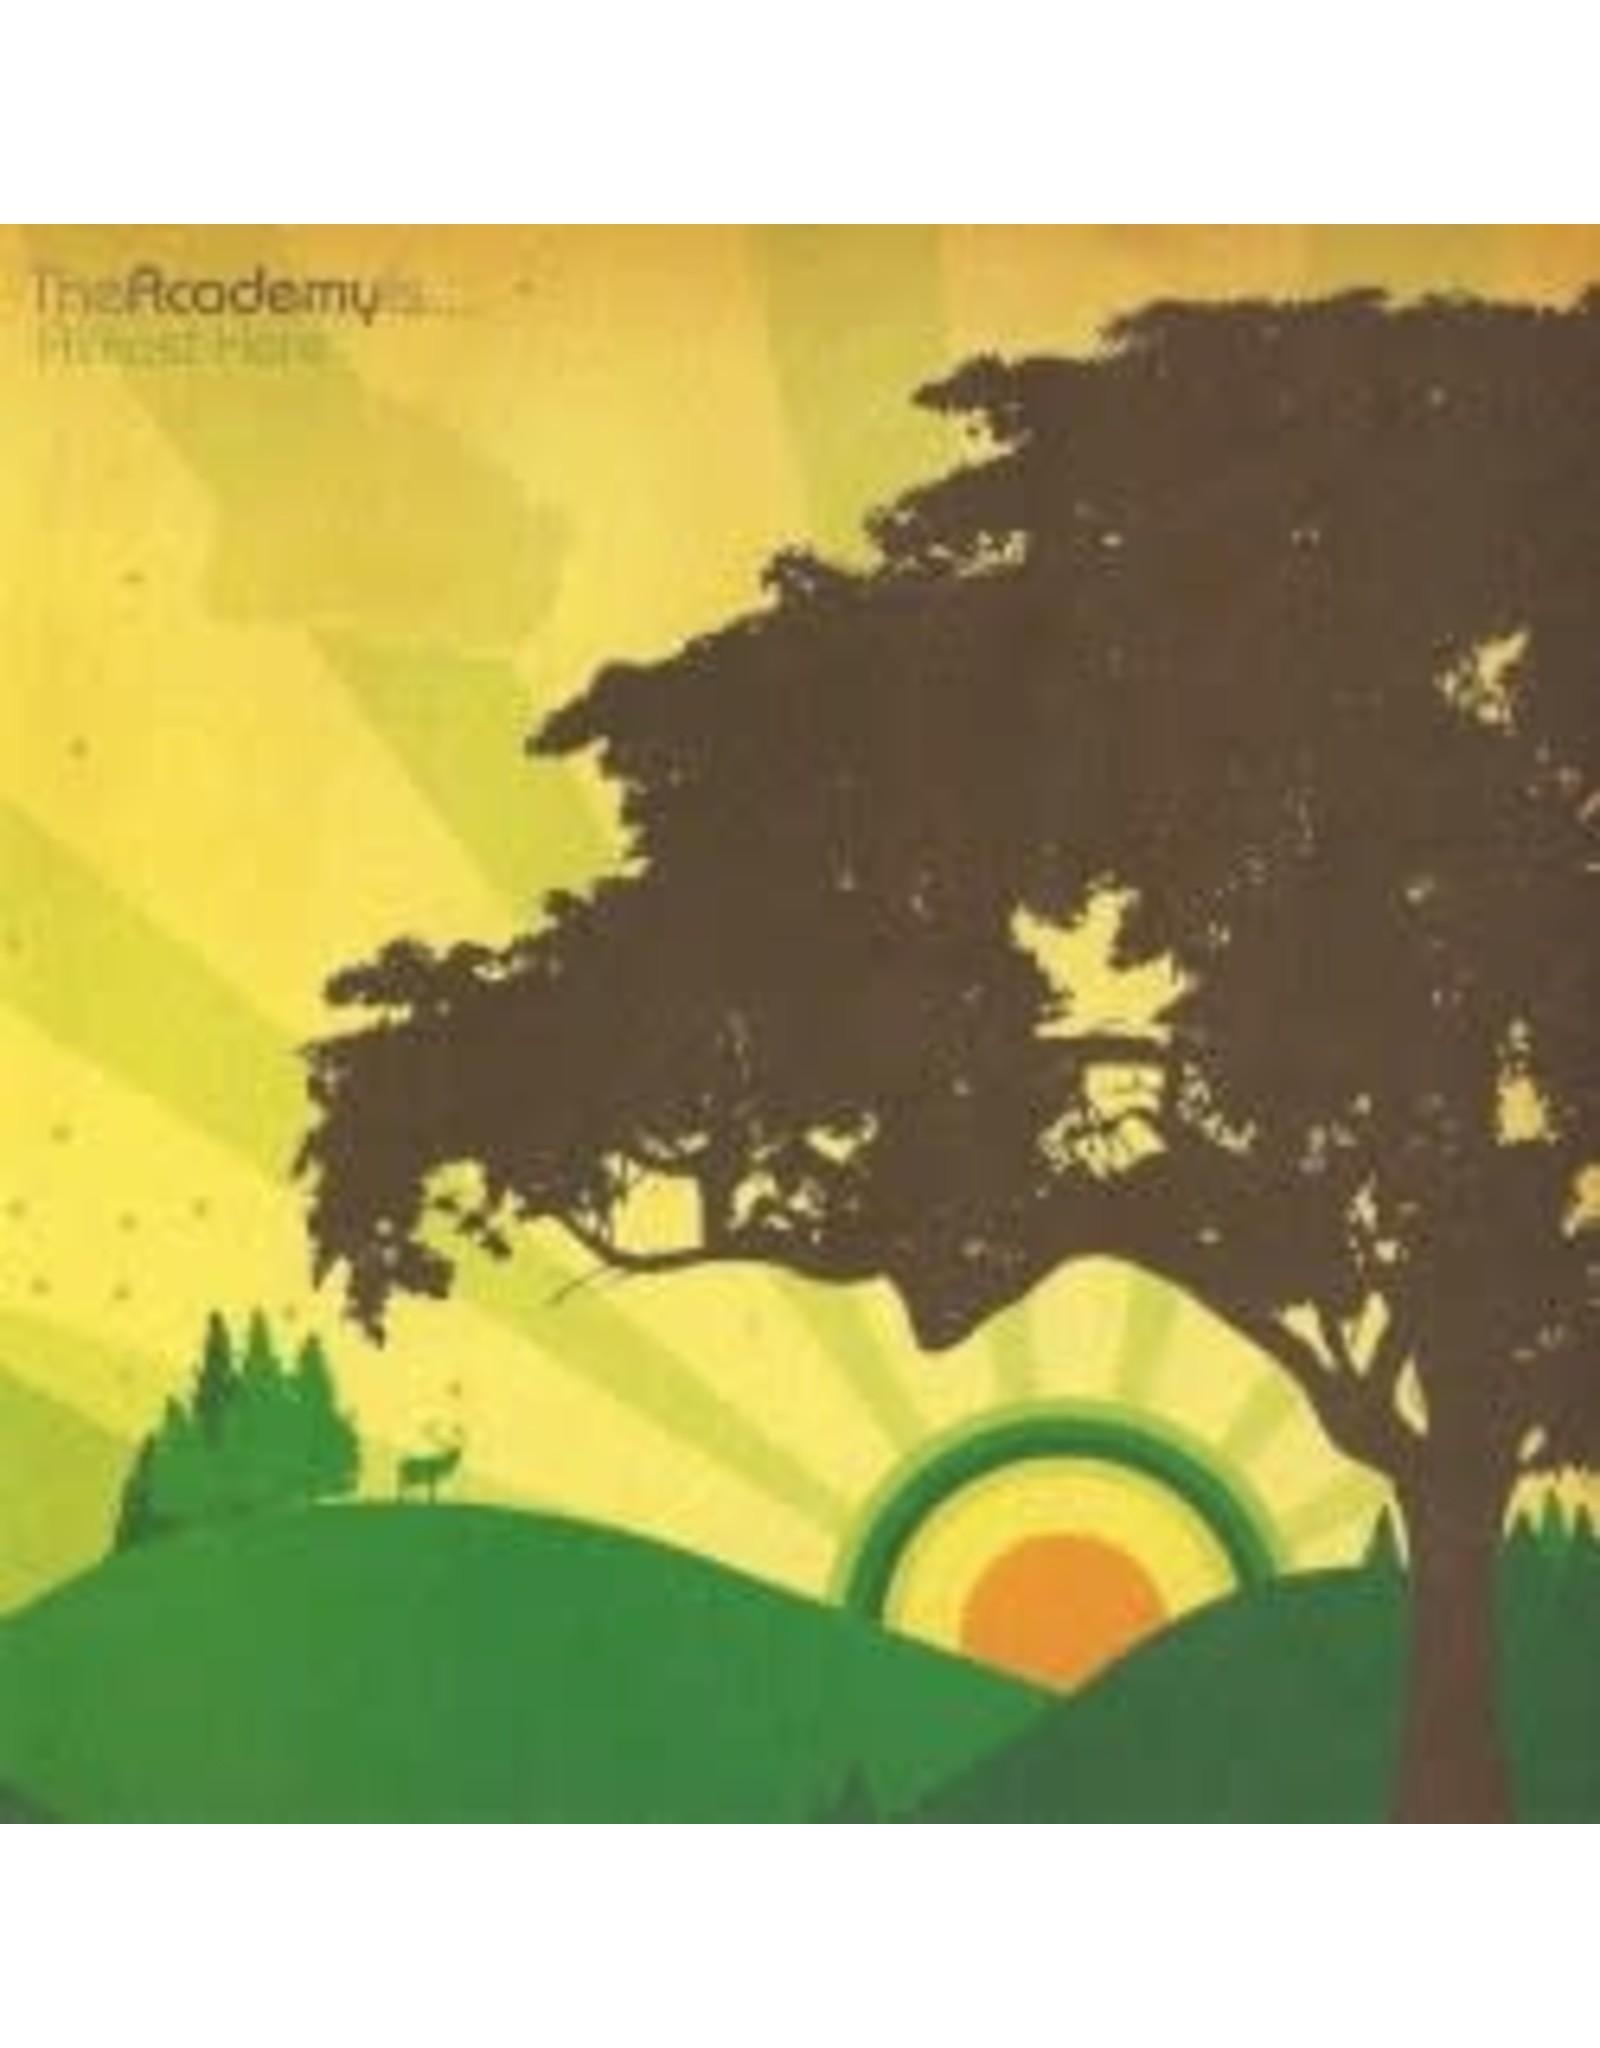 Academy Is - Almost Here LP (Ltd Silver Vinyl)